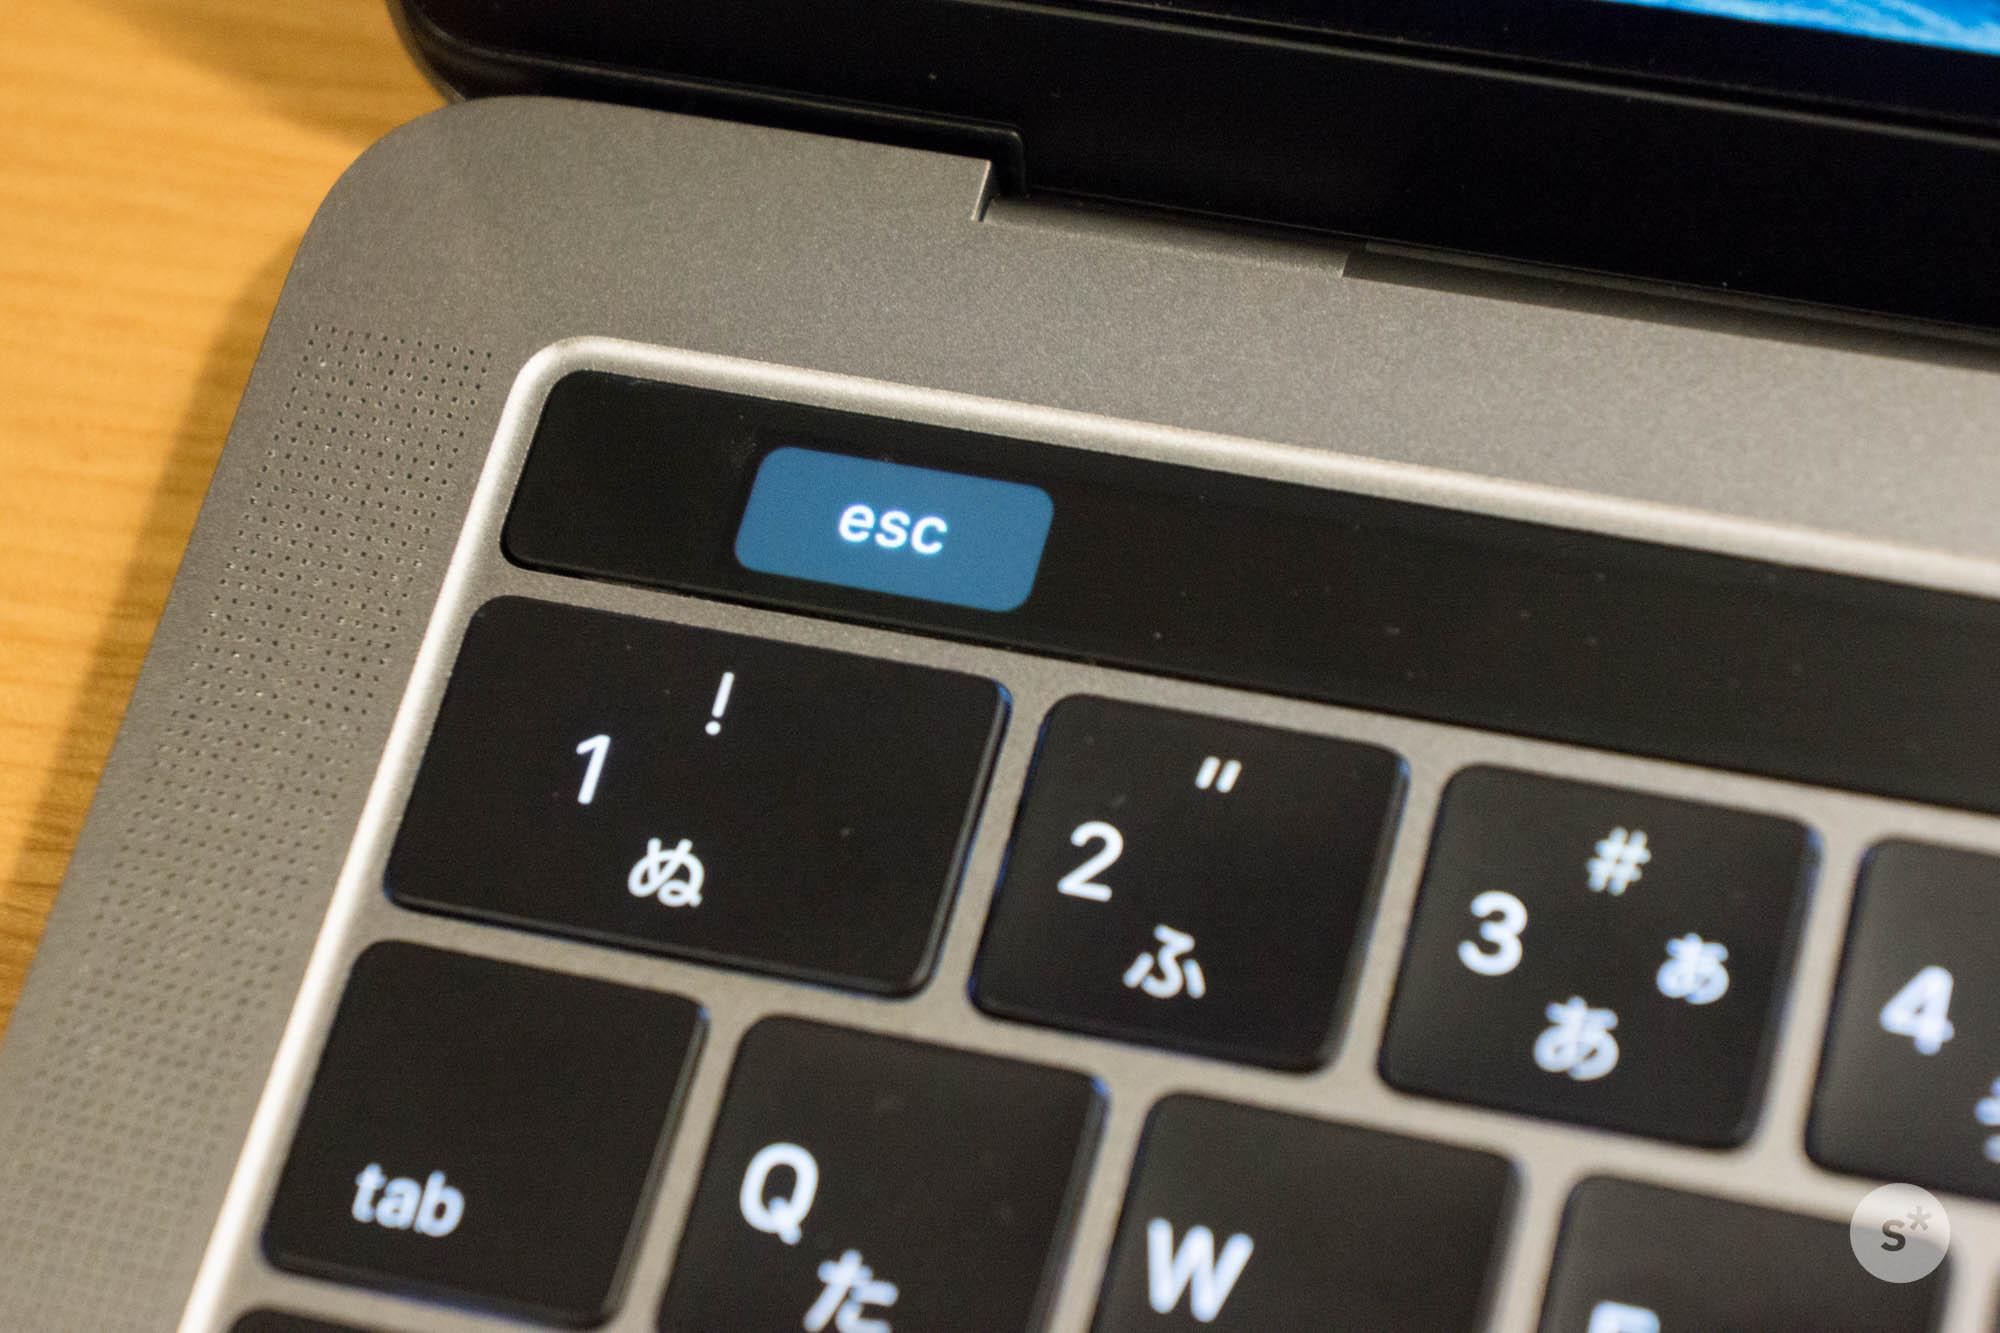 esc-key